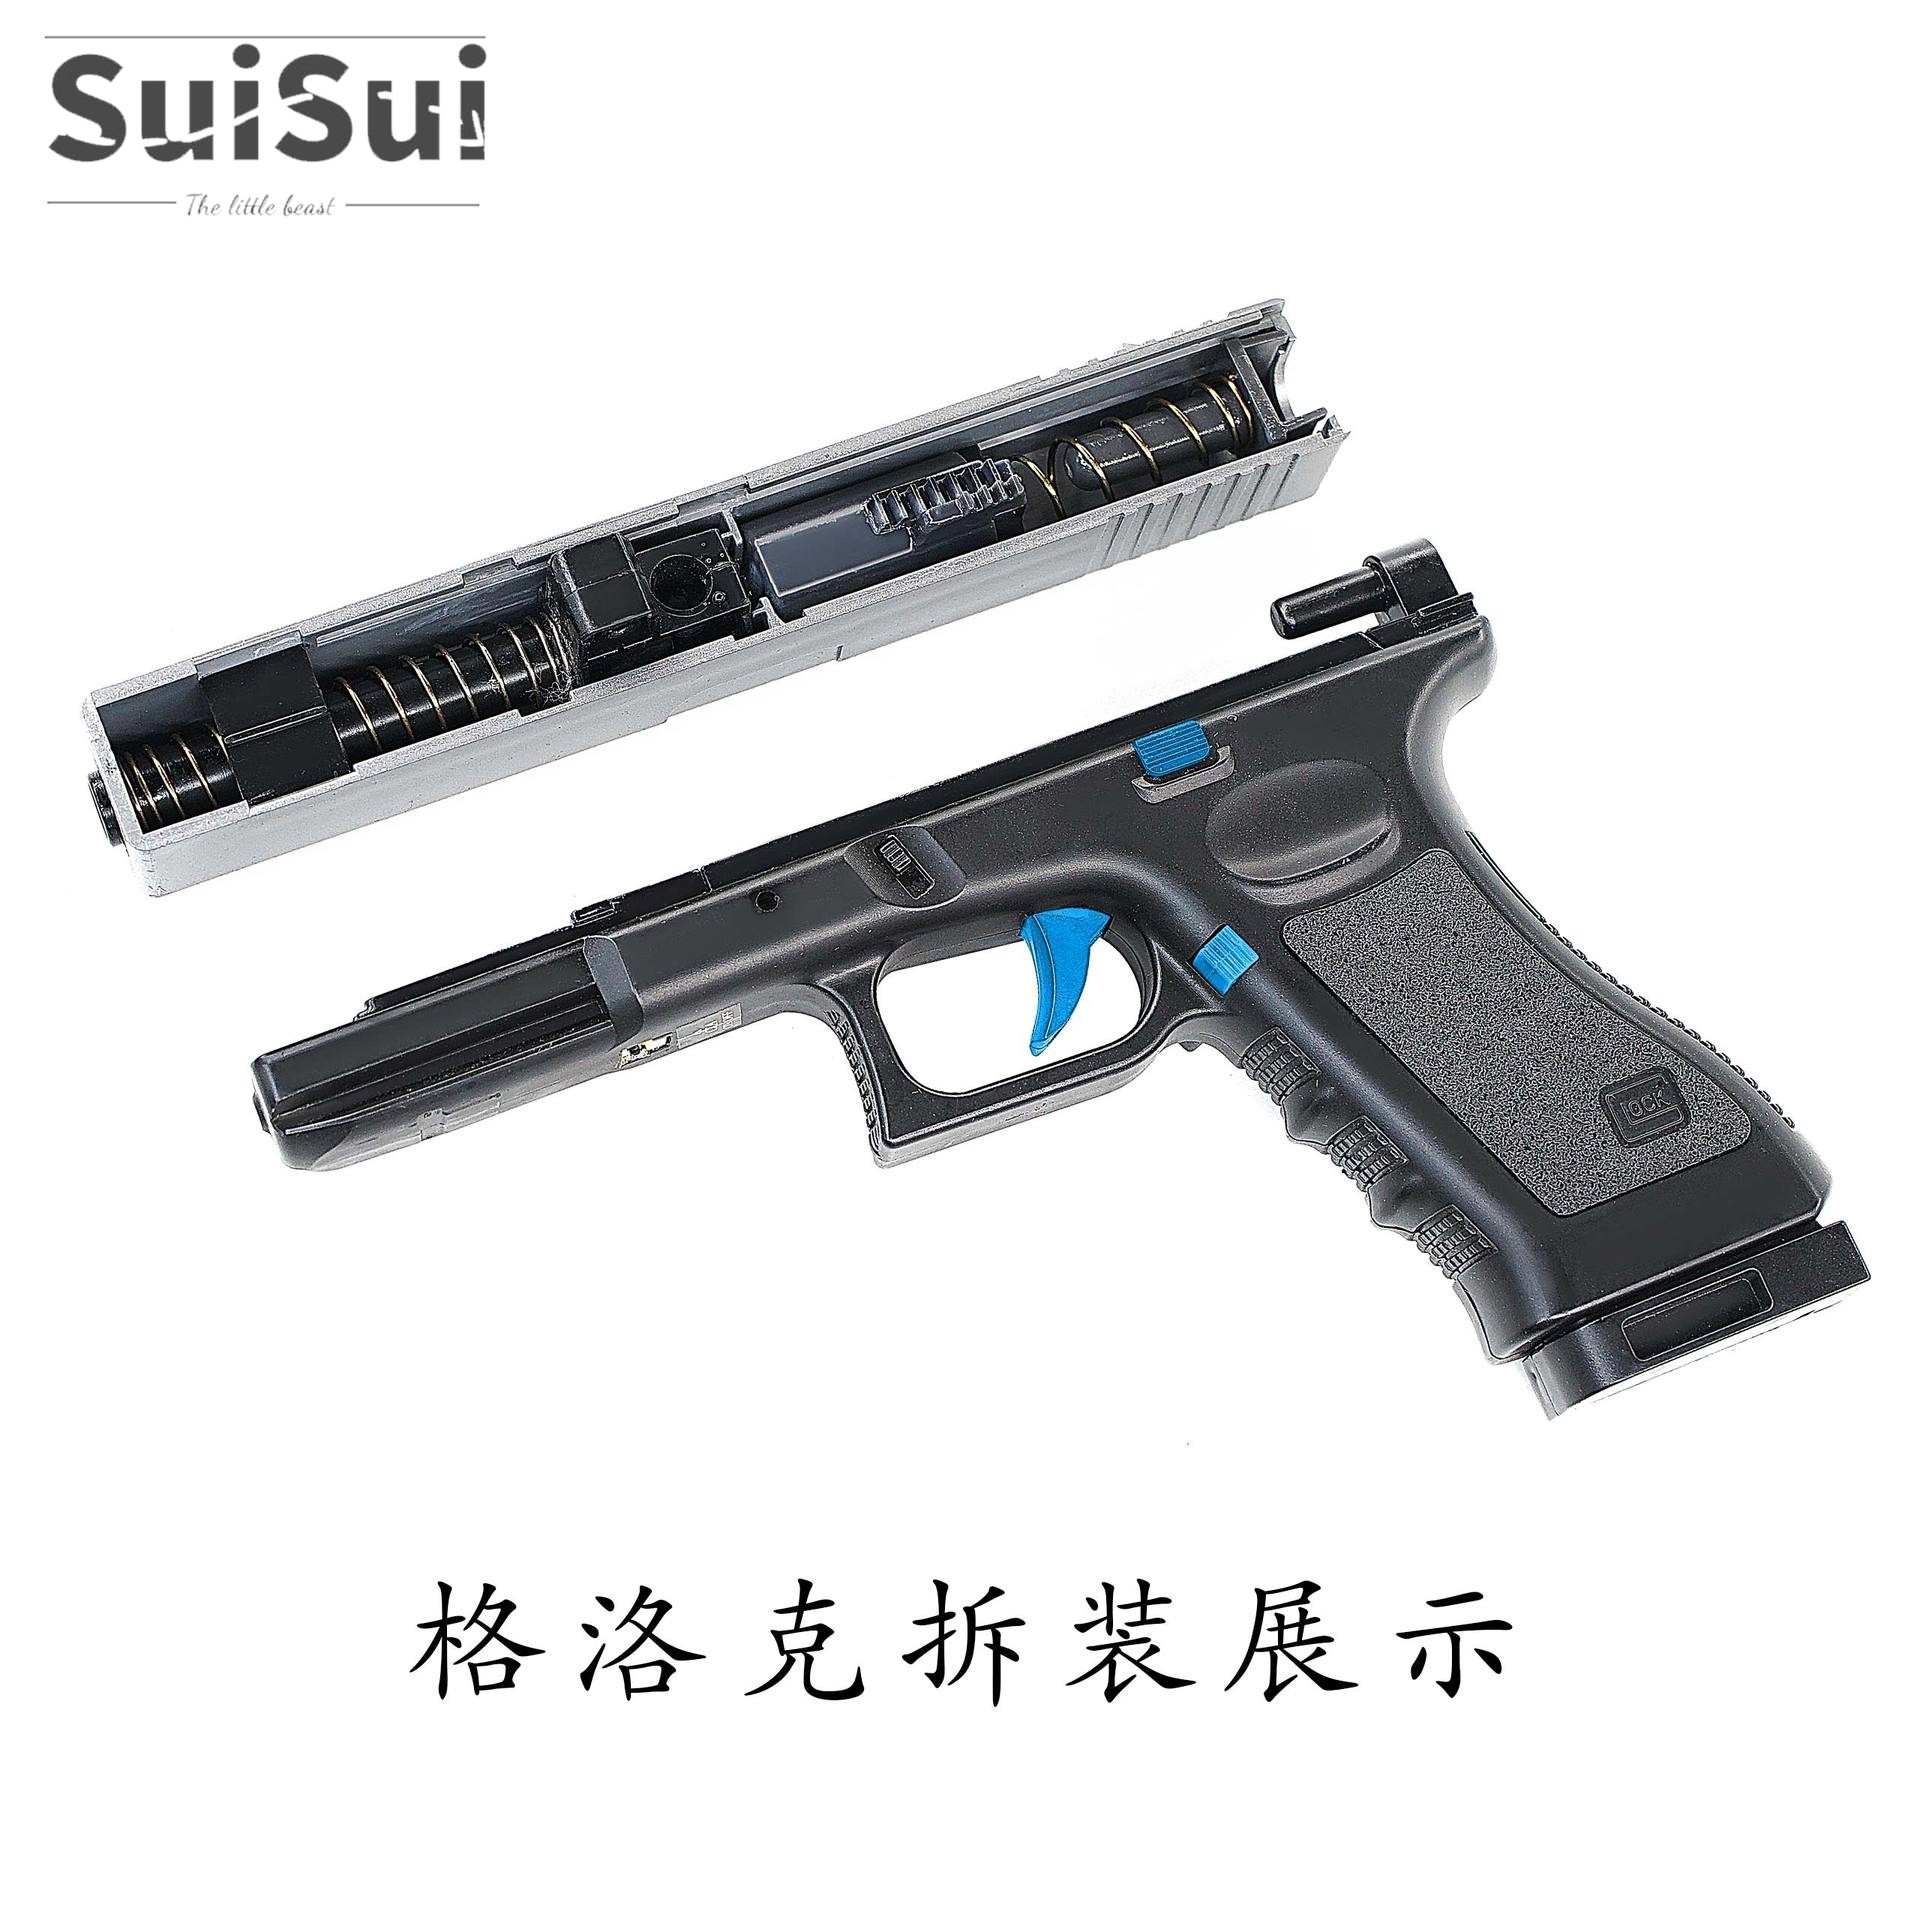 Suisui Skd Skodi Glock G18 Water Supply Bomb Electric Single Burst Can Fire Water Bomb Gun Cs Original Toy Gun Shopee Malaysia